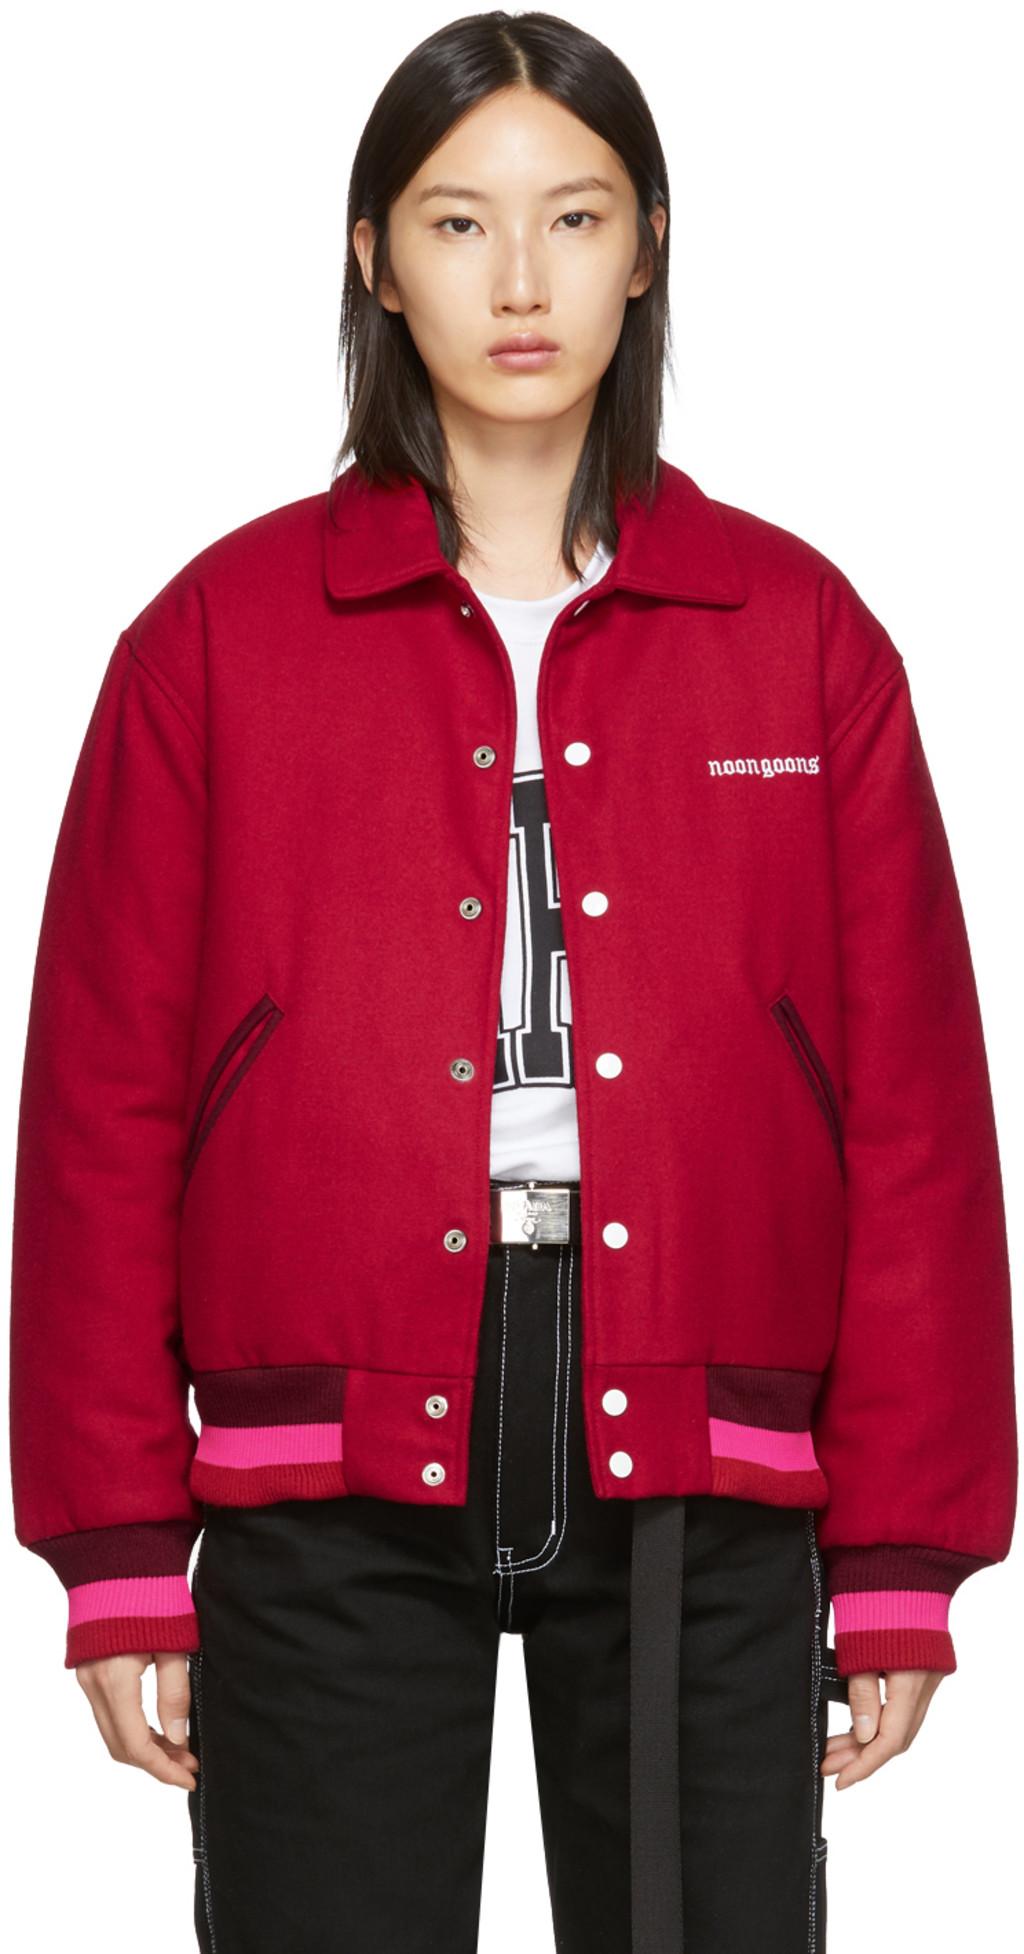 22a389eb0 Red Old English Varsity Jacket